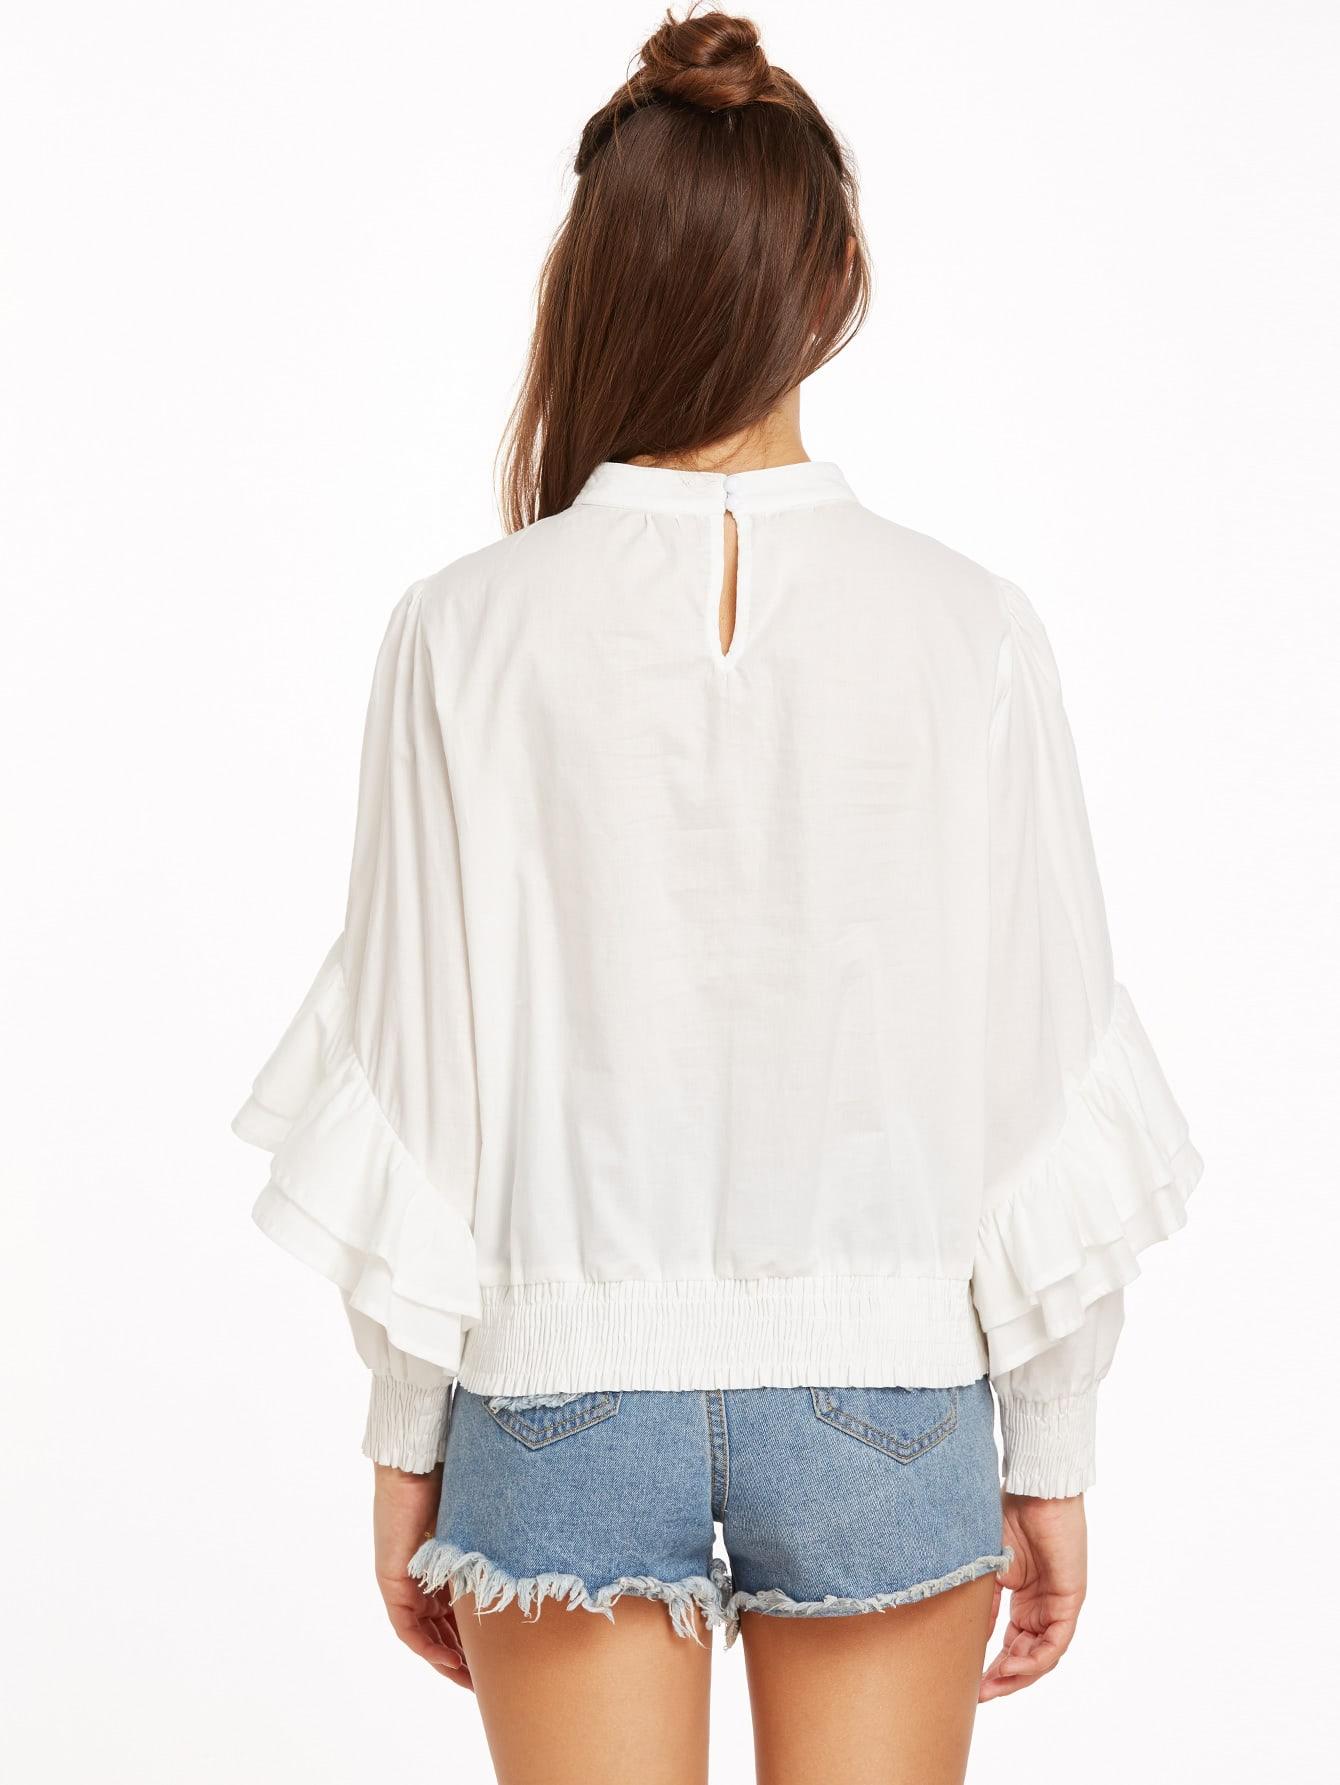 blouse161119705_2